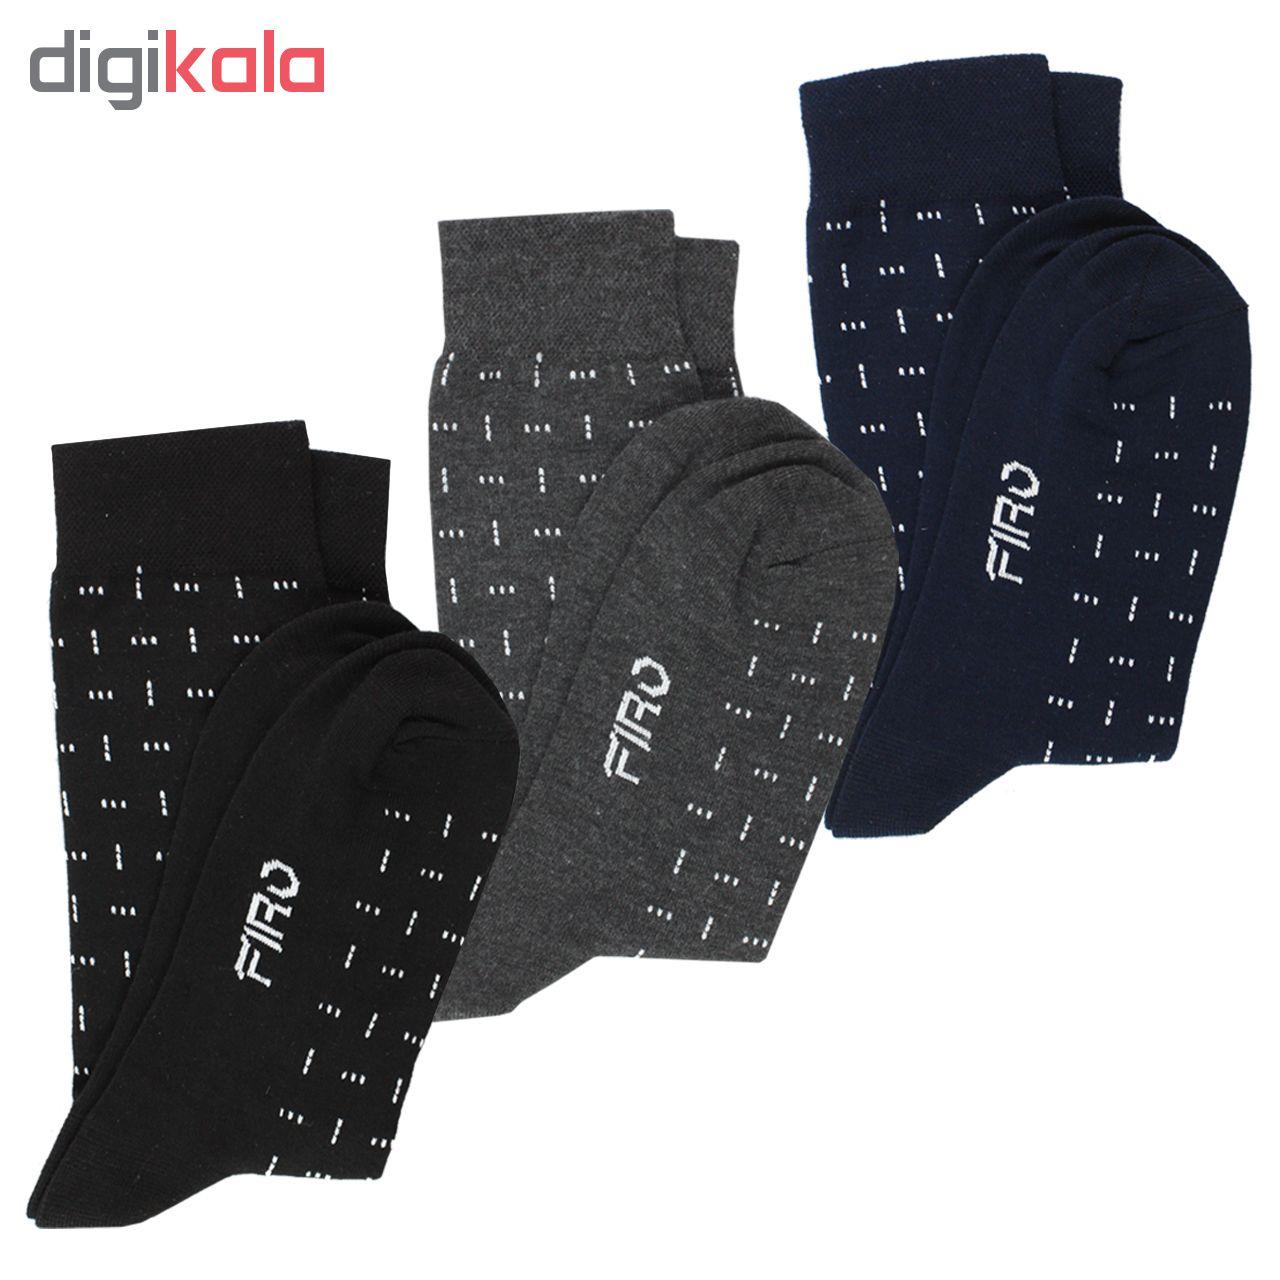 جوراب مردانه فیرو مدل FT240 بسته 3 عددی